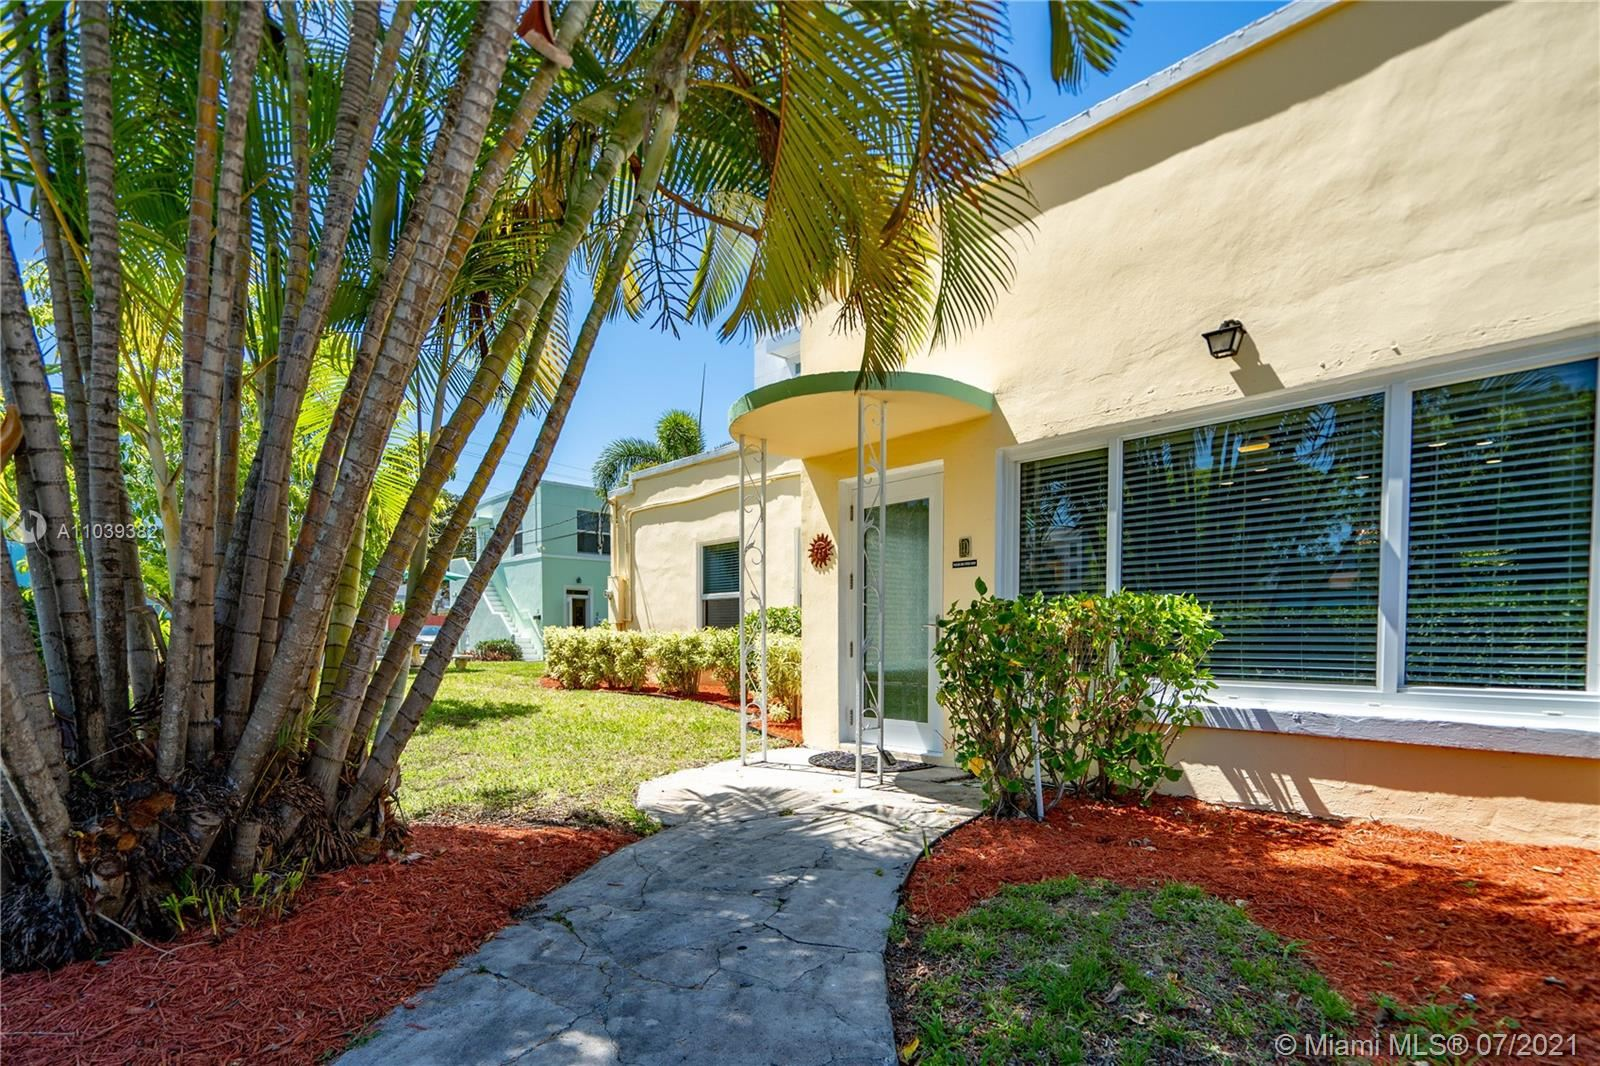 Photo of 90 SE 5th Ave #10, Delray Beach, FL 33483 (MLS # A11039382)